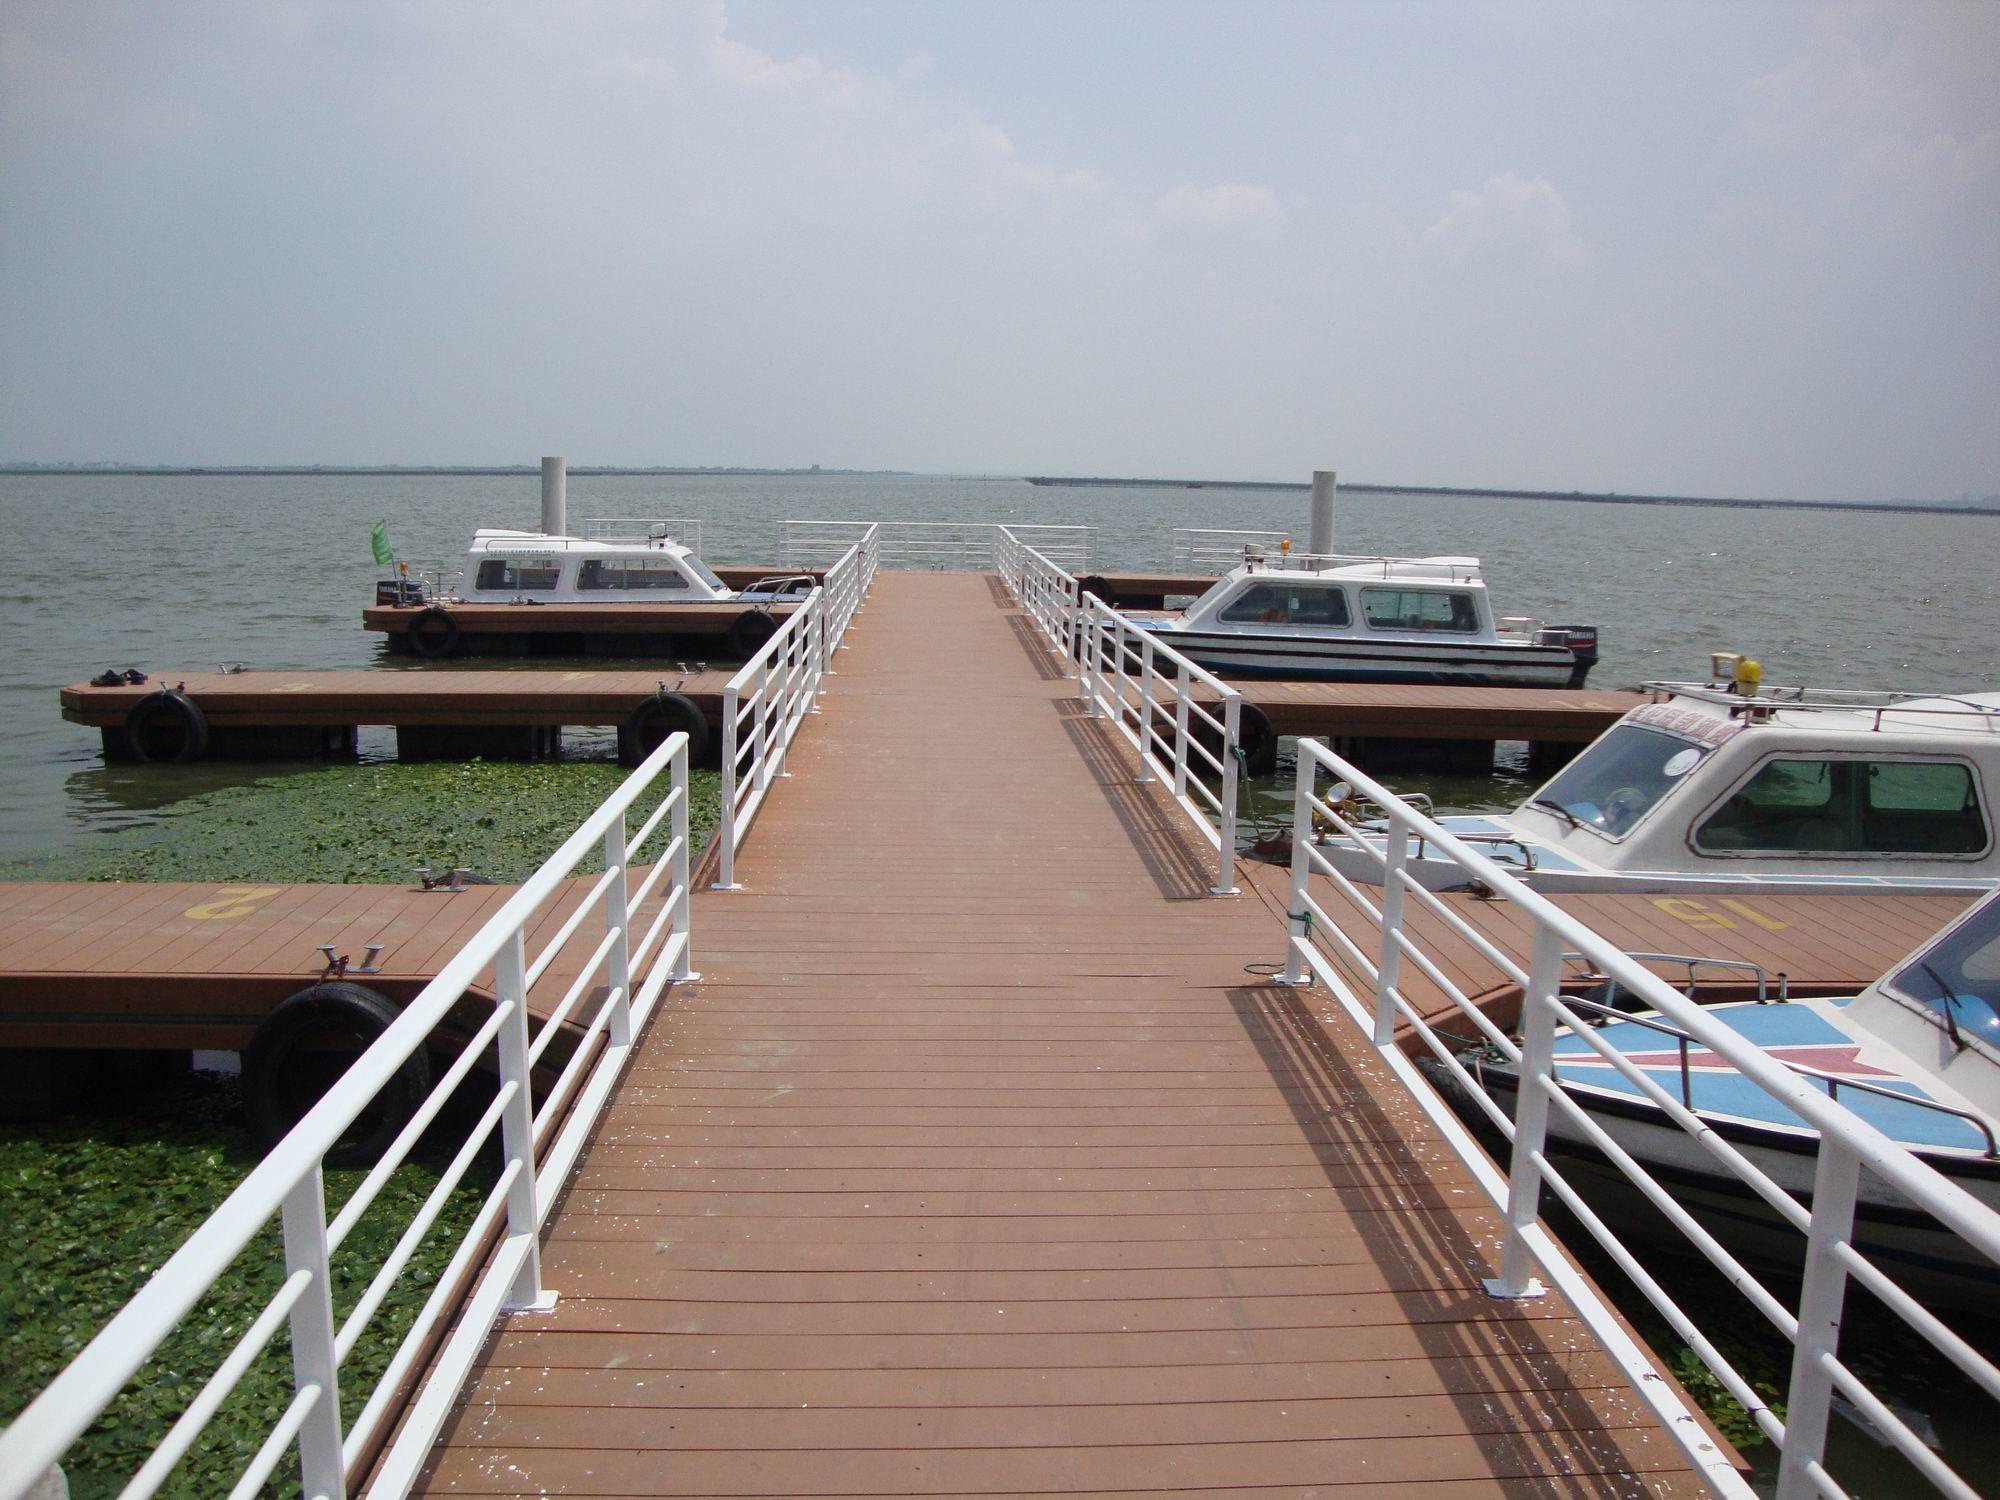 composite deck joist span table,composite decking supplier